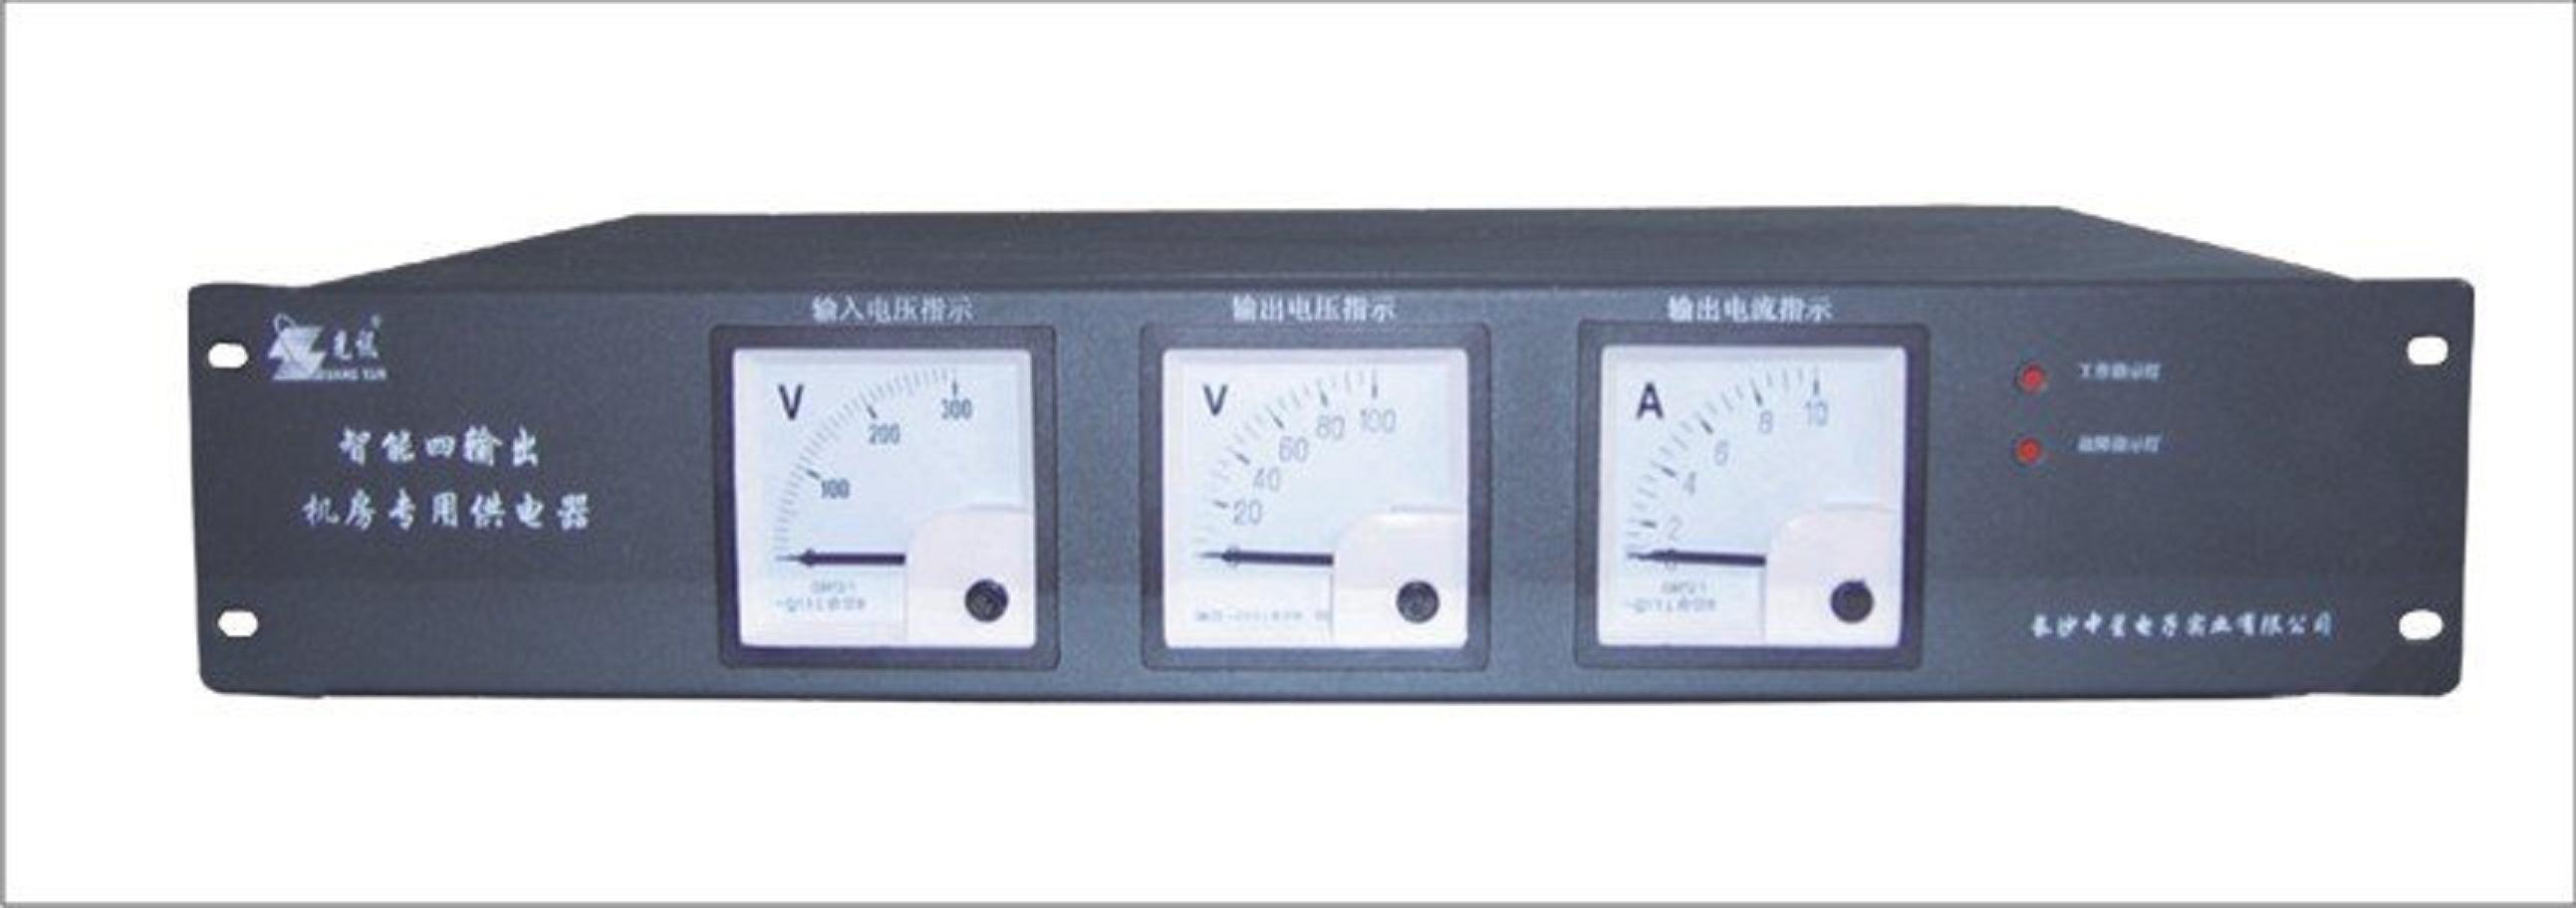 Optical Receiver/Optical Node for Engine Room (HKTGS-004)